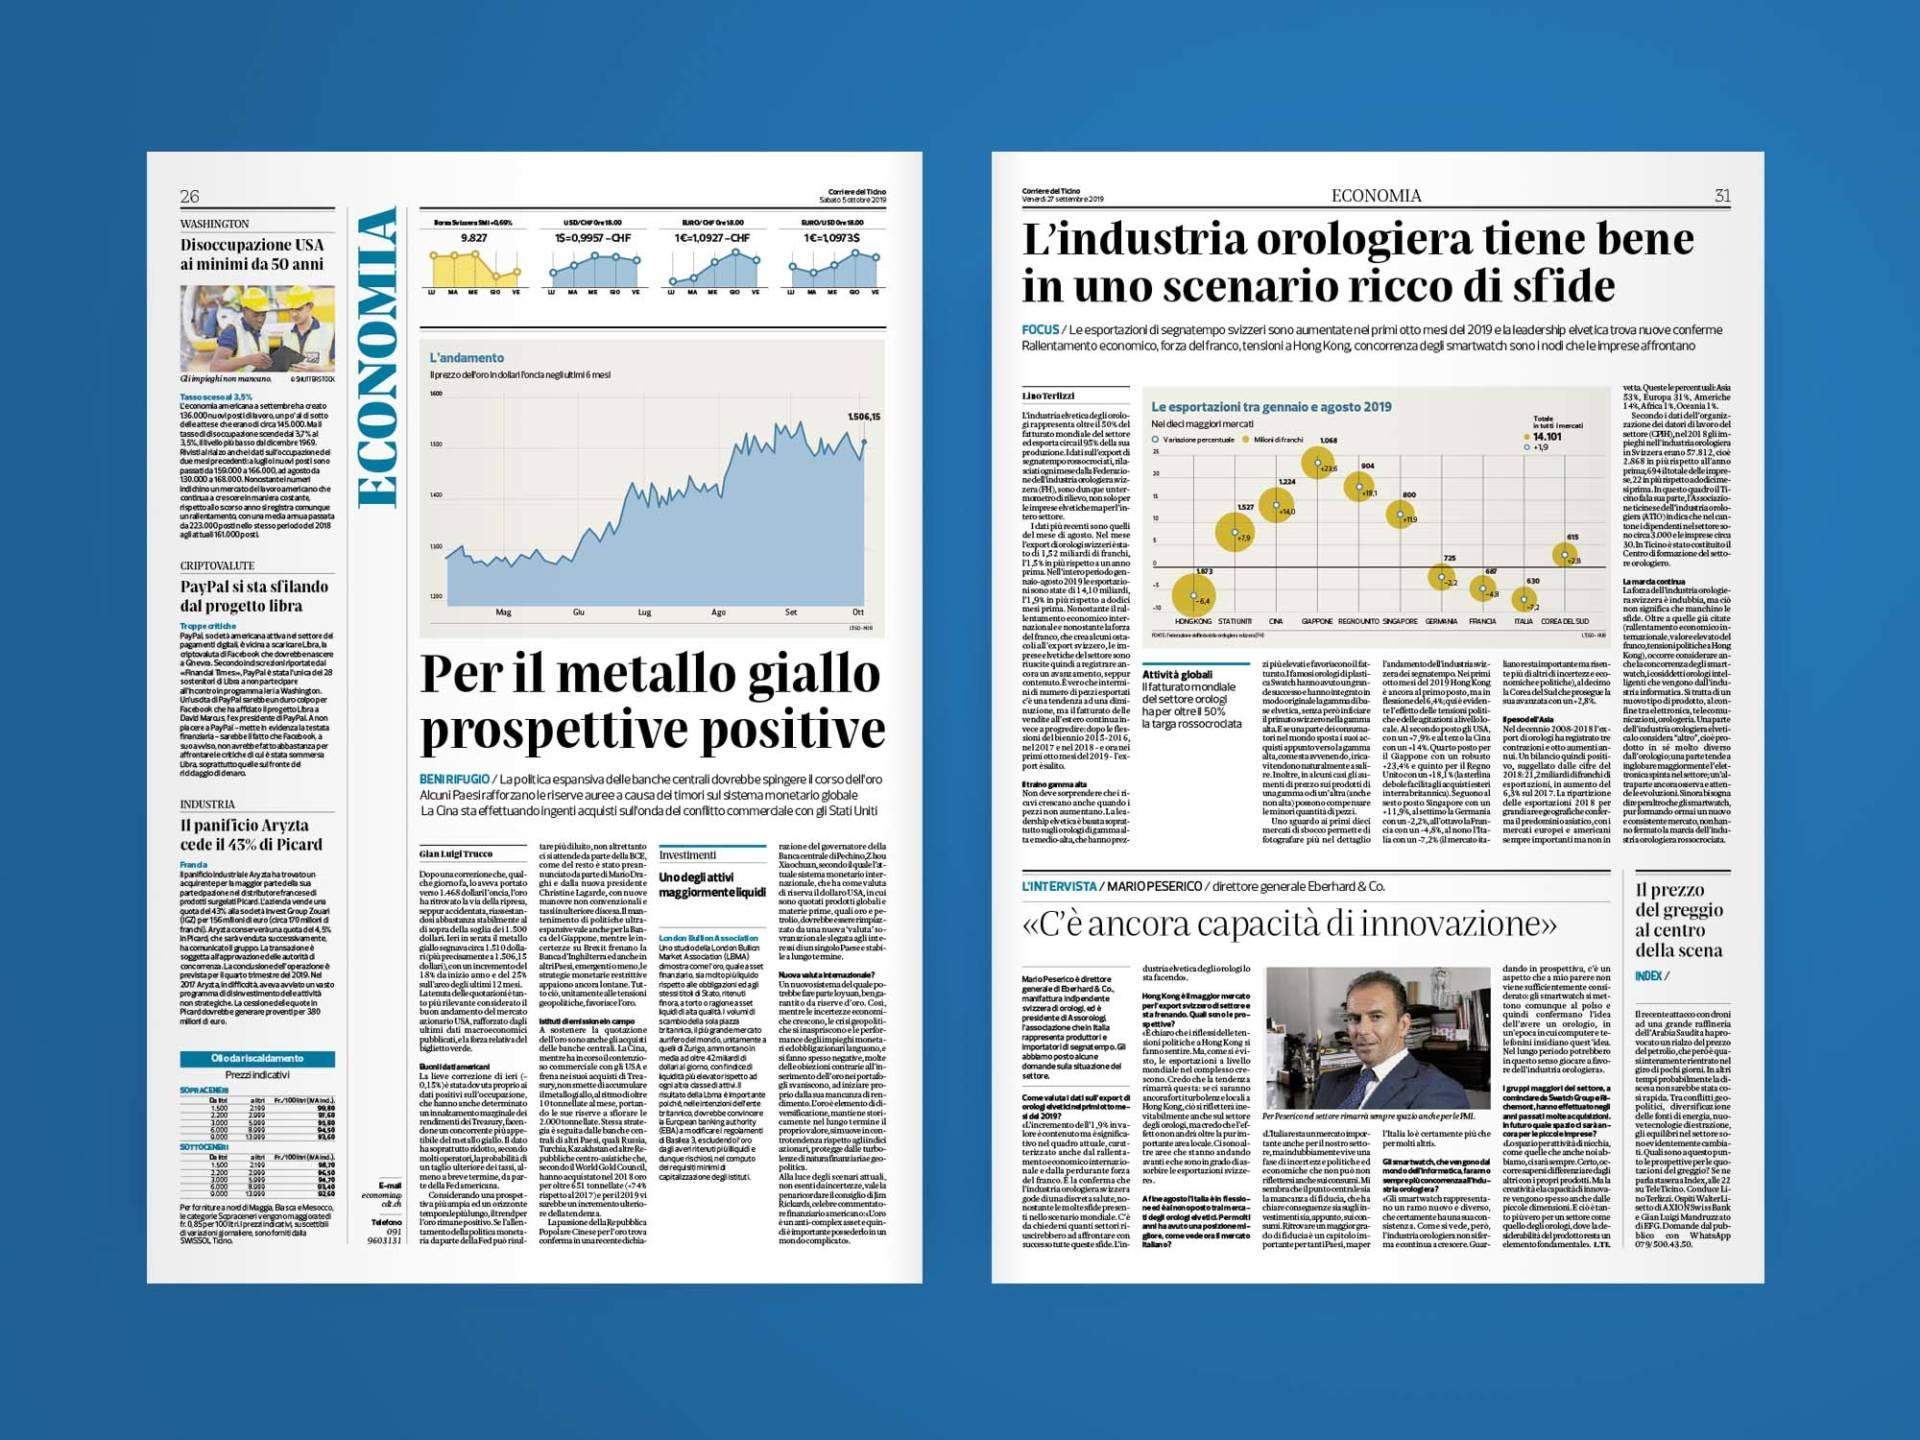 Corriere_del_Ticino_Info_10_Wenceslau_News_Design